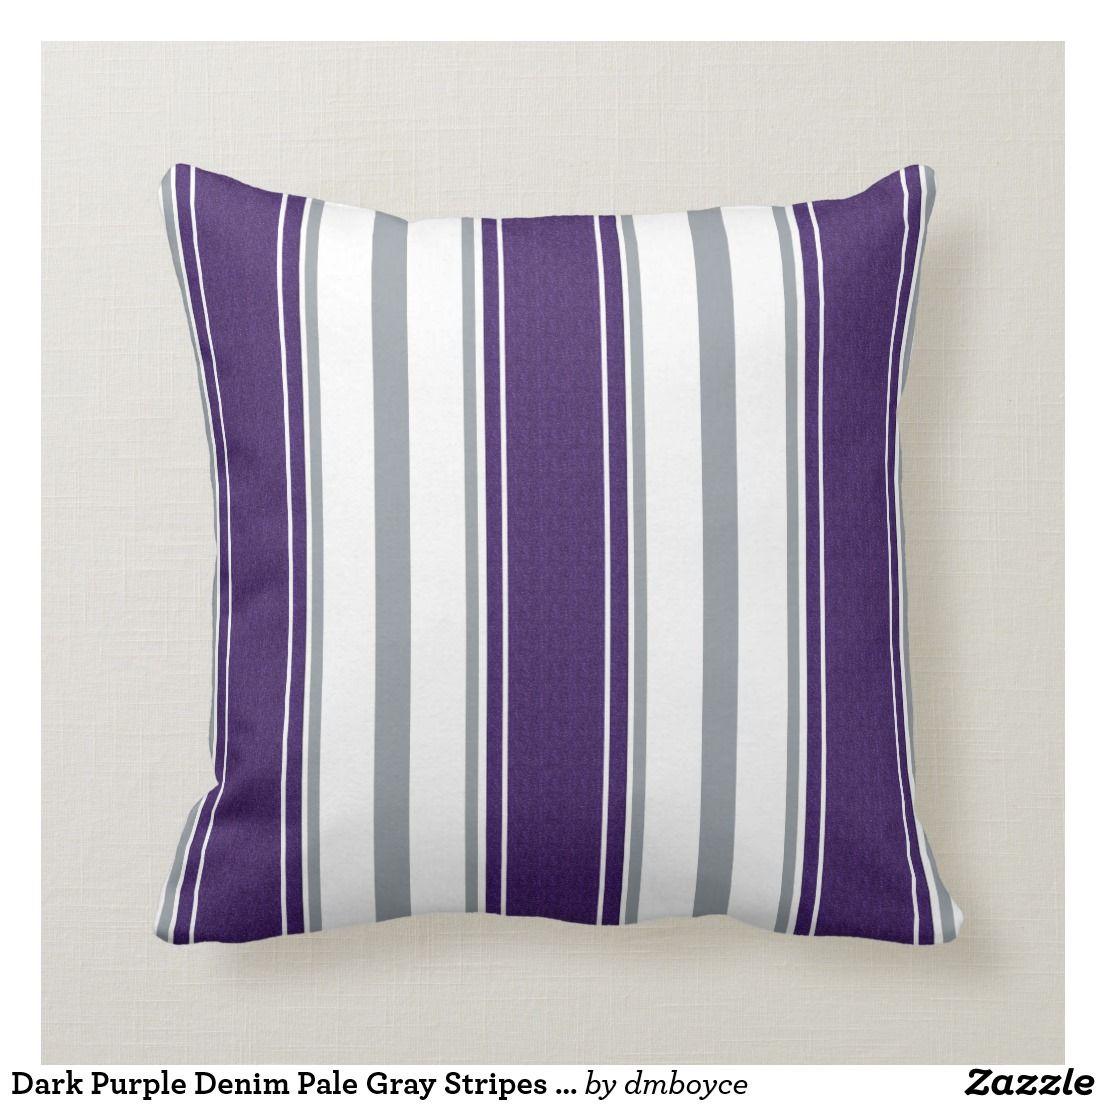 Dark Purple Denim Pale Gray Stripes Pattern | Throw Pillow | Zazzle.com